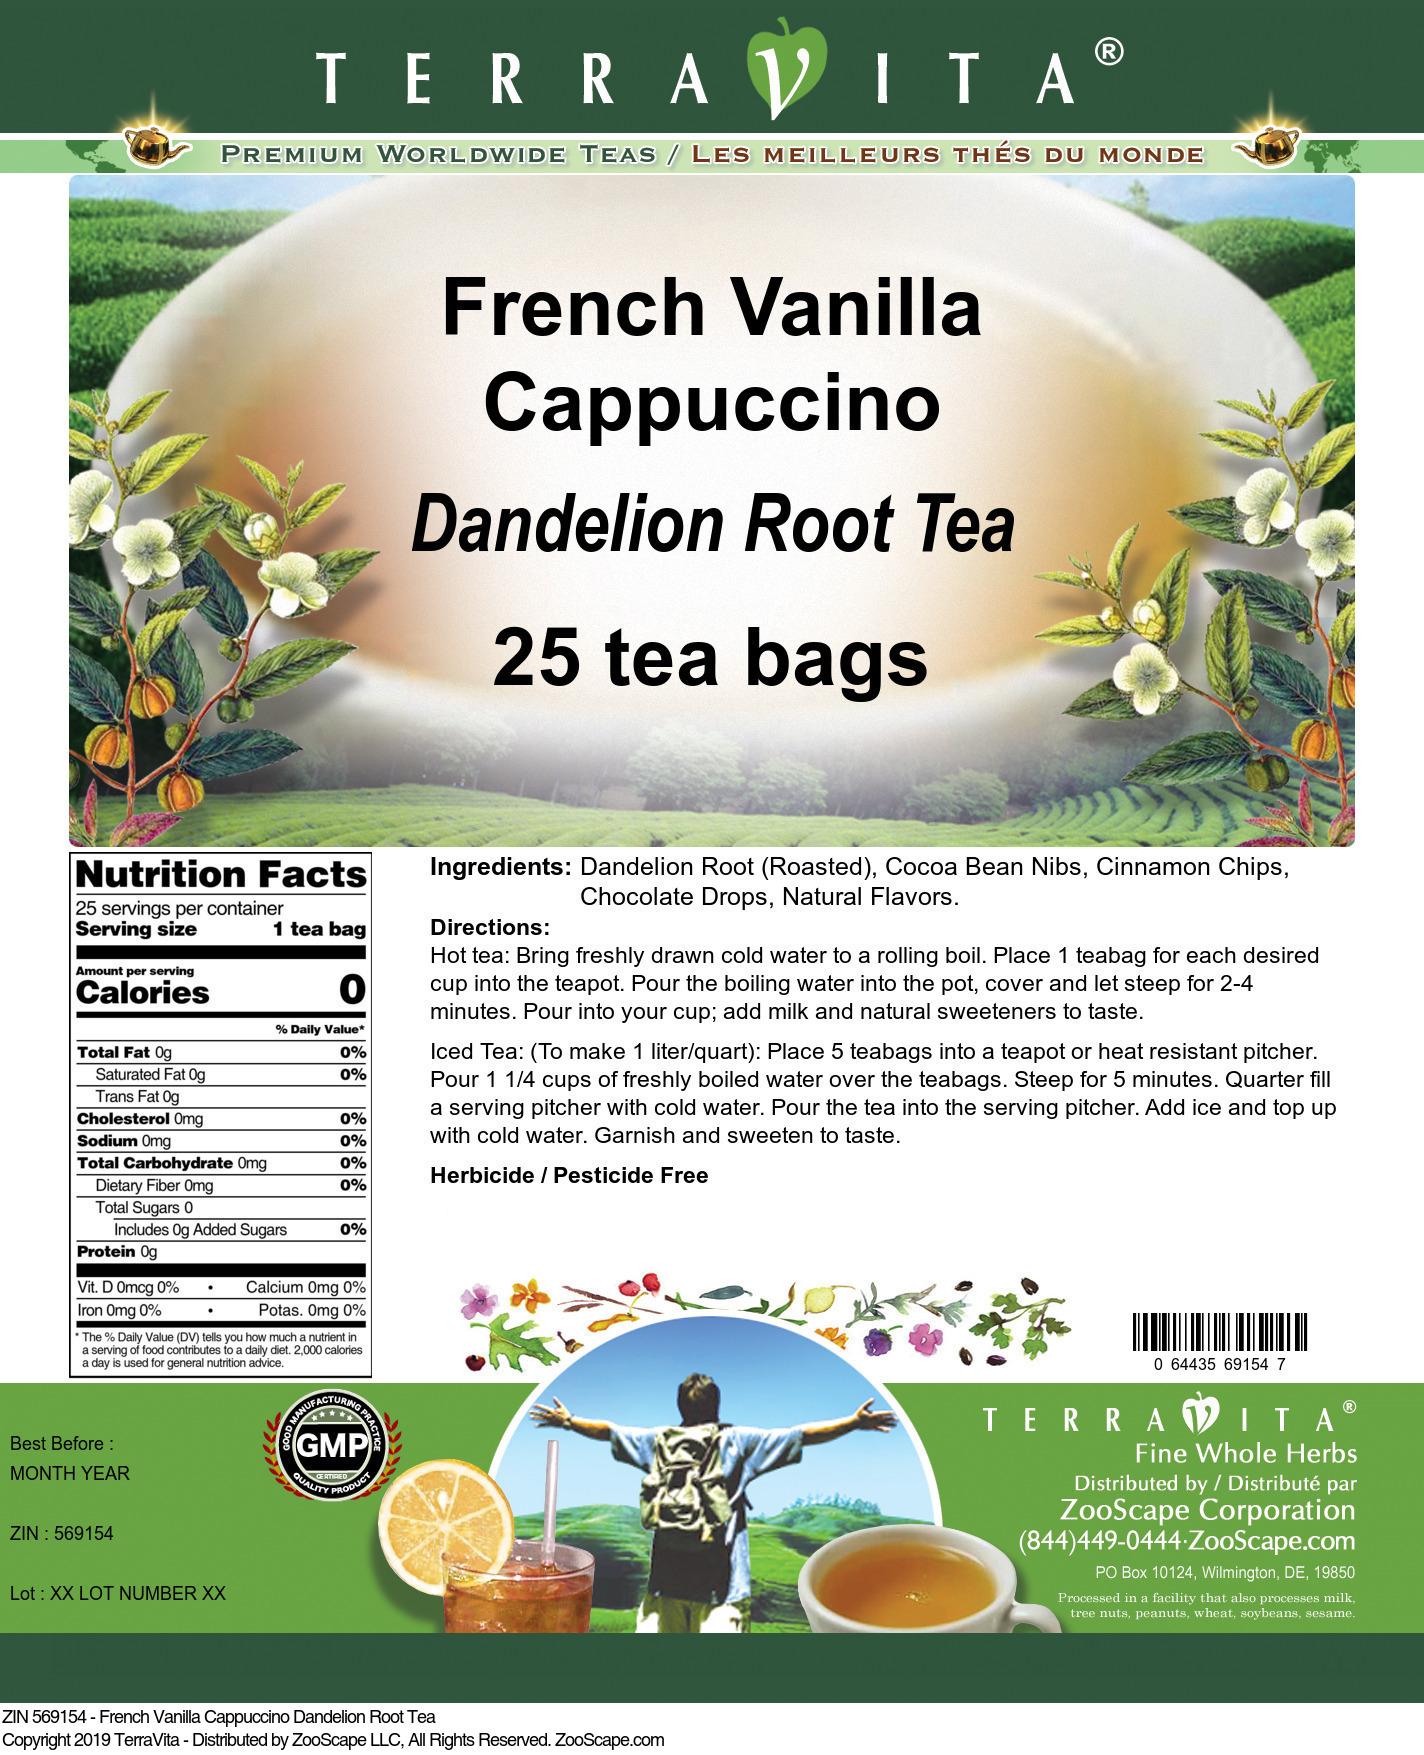 French Vanilla Cappuccino Dandelion Root Tea